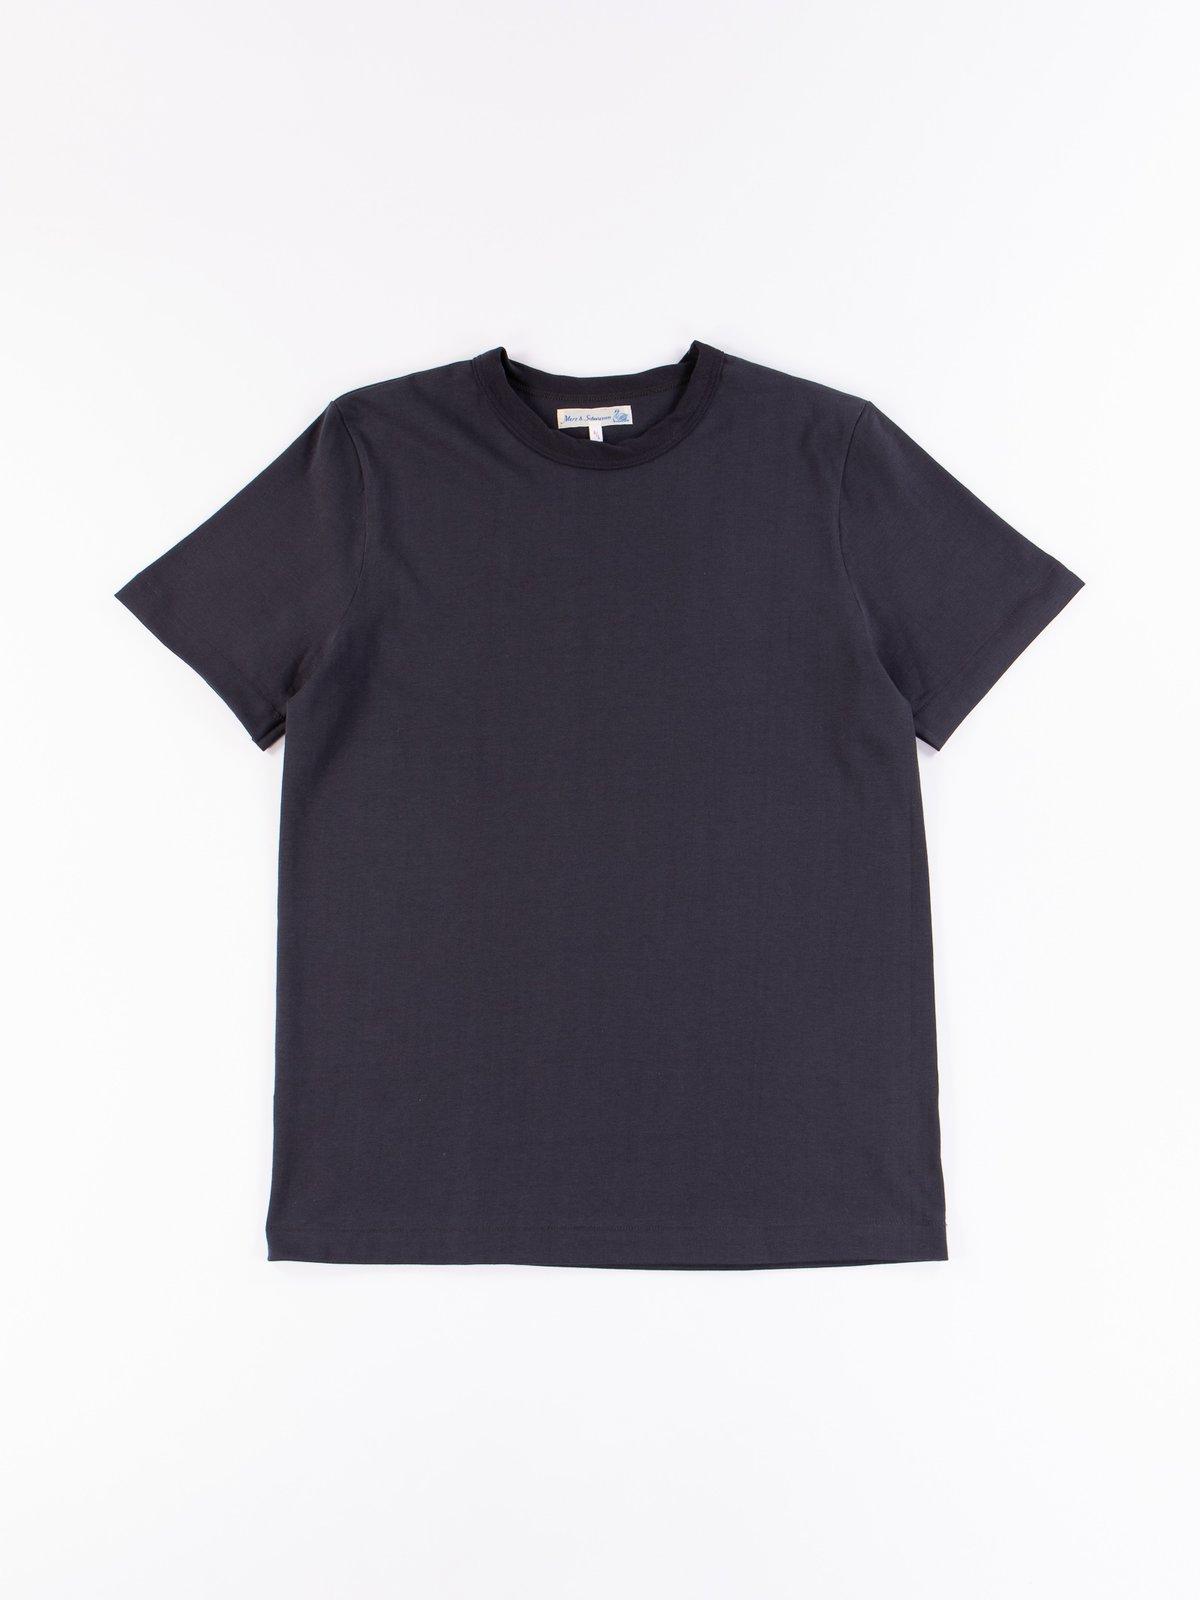 Slate 214 Organic Cotton Rundhals Shirt - Image 1